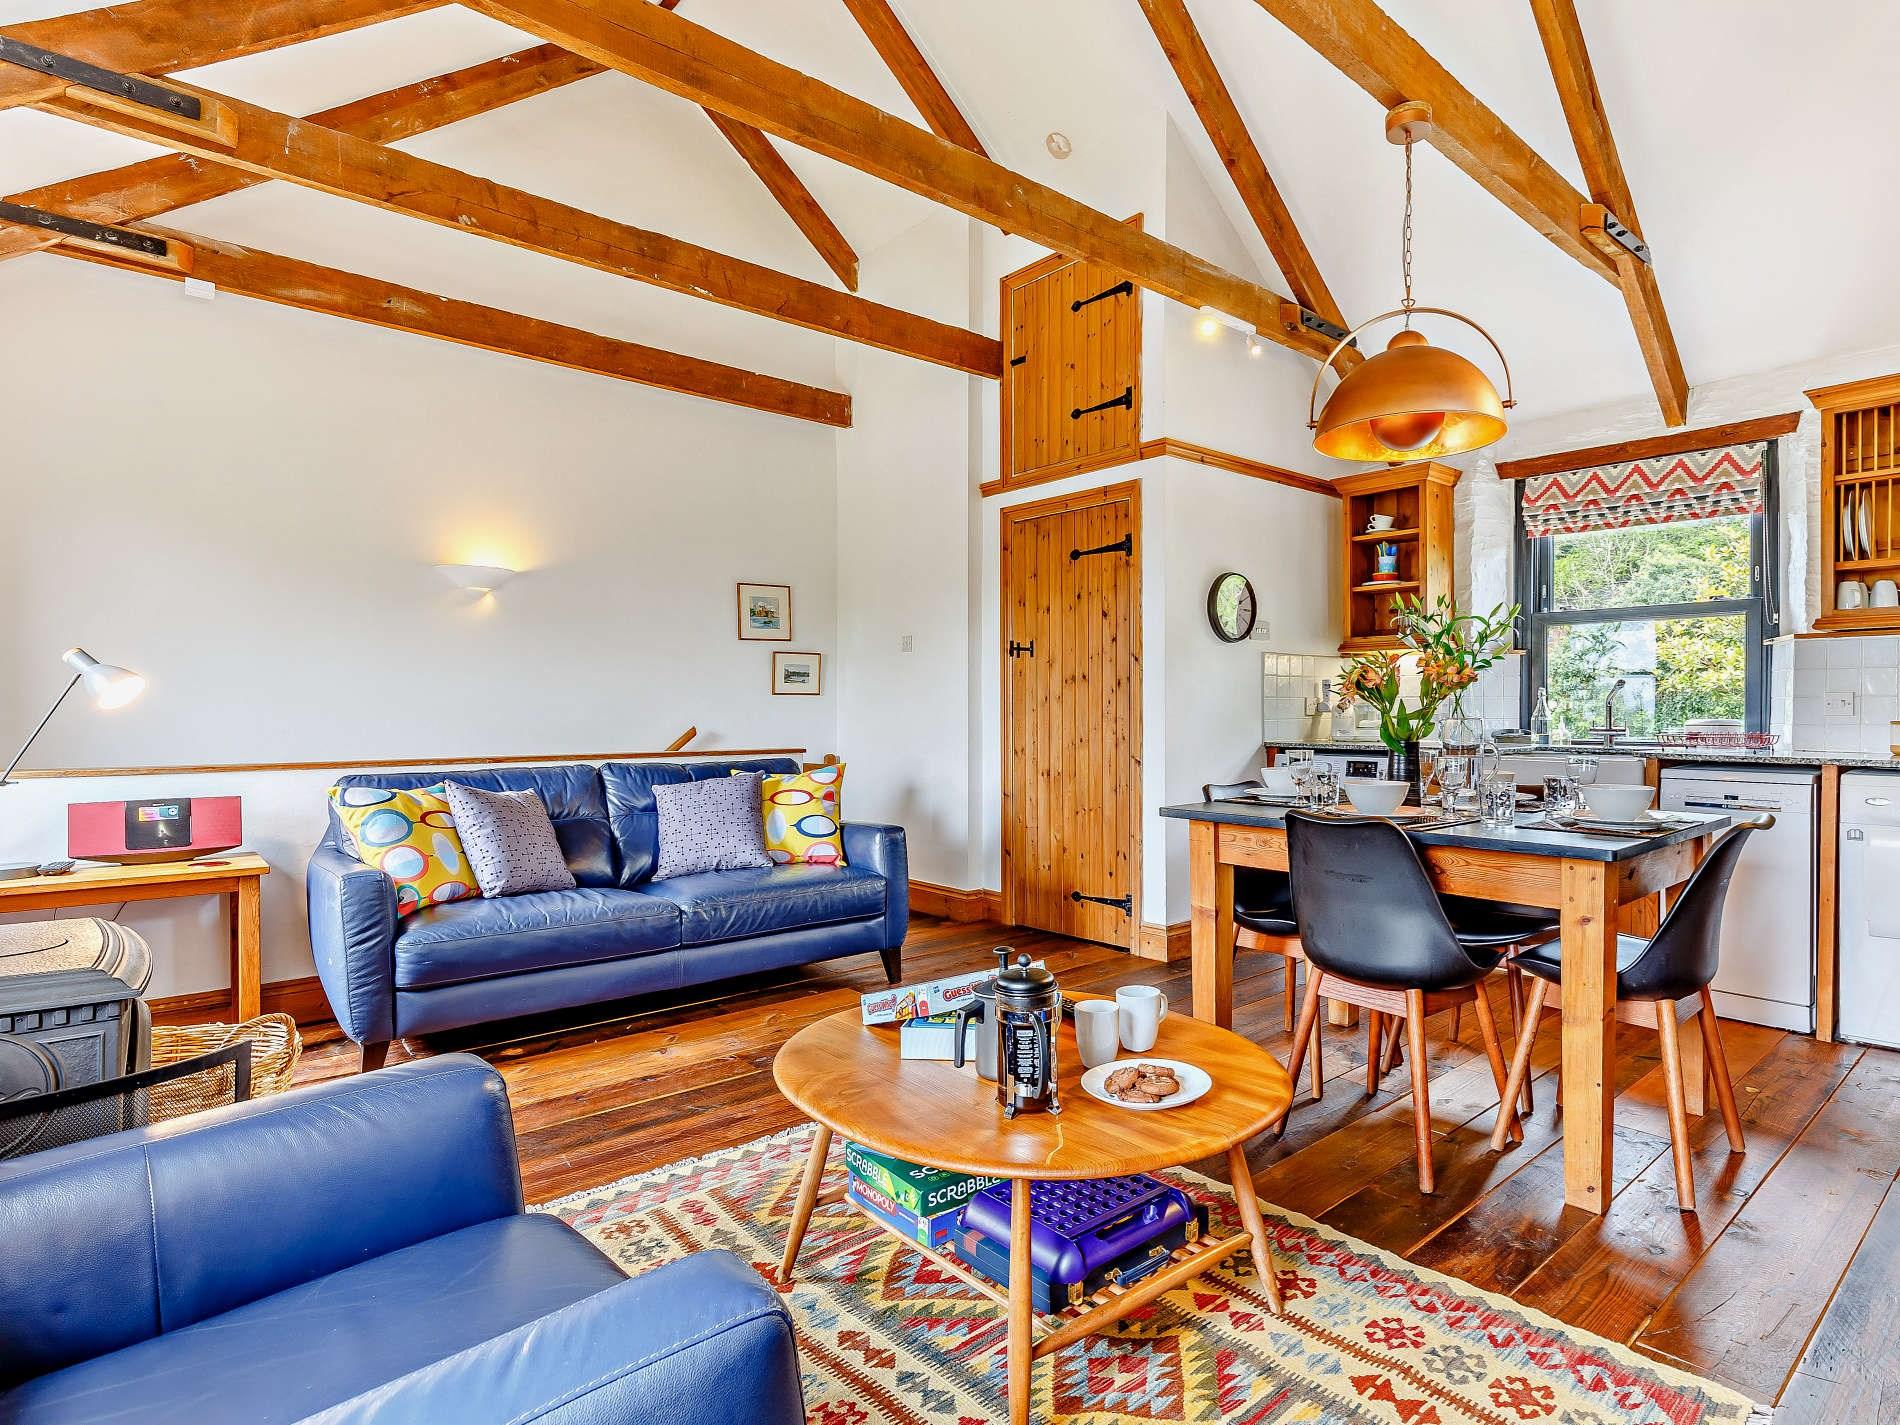 2 Bedroom Barn in South Cornwall, Cornwall